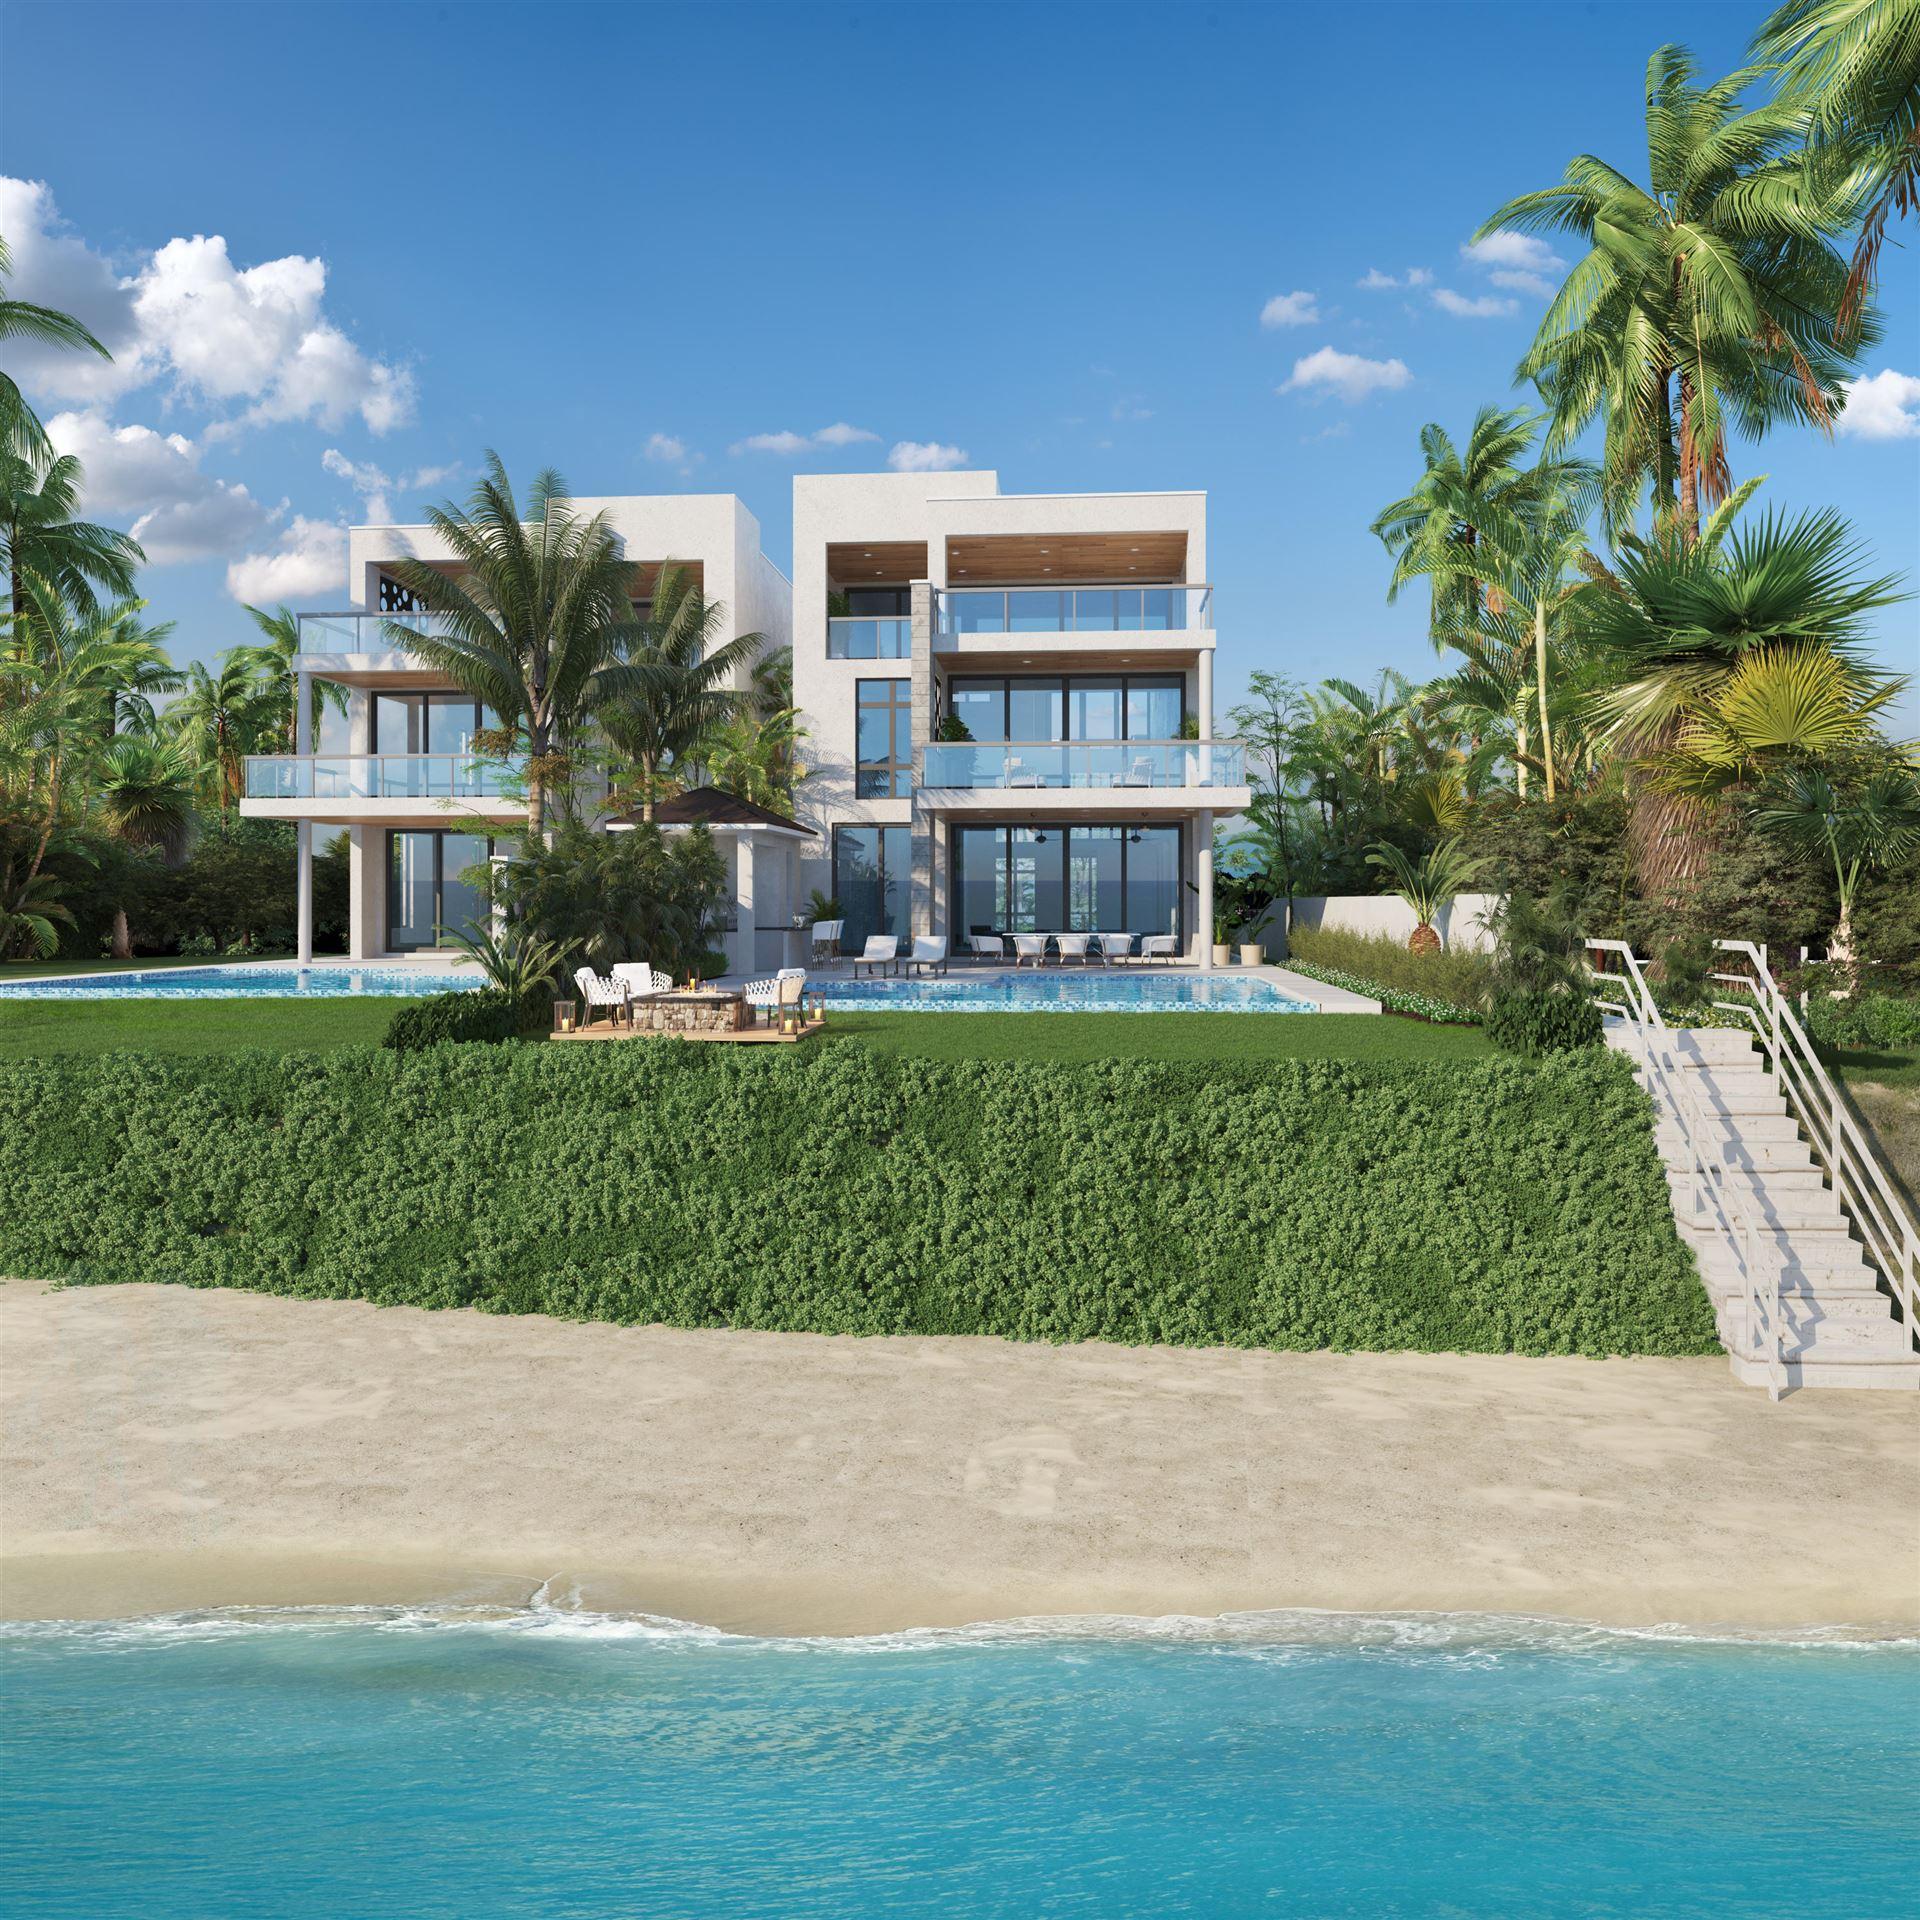 4513 S Ocean Boulevard, Highland Beach, FL 33487 - MLS#: RX-10633757